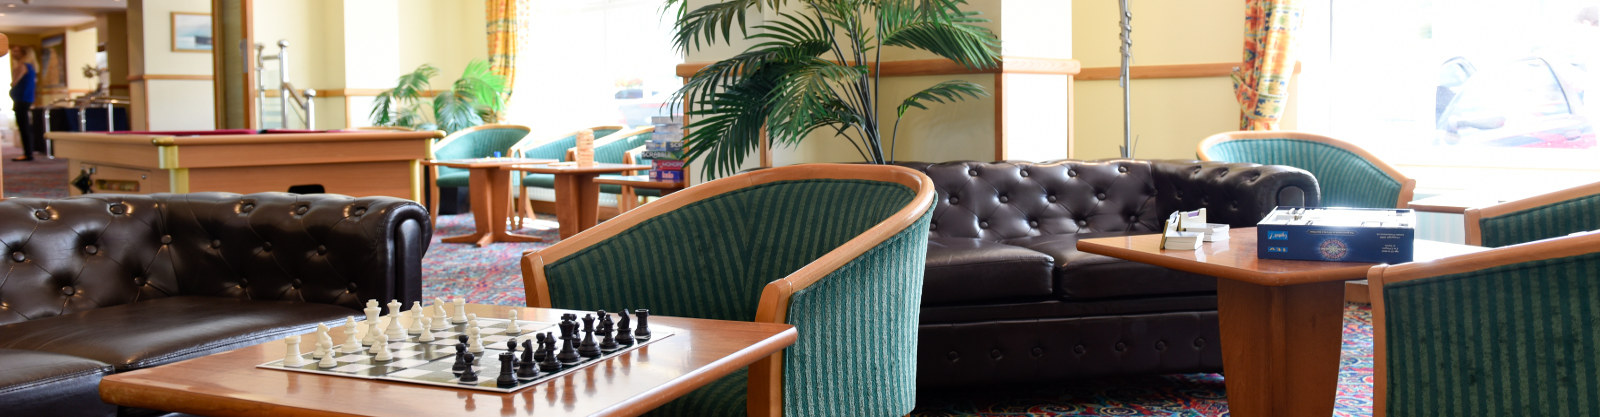 games-area-bar-riviera-hotel-bournemouth